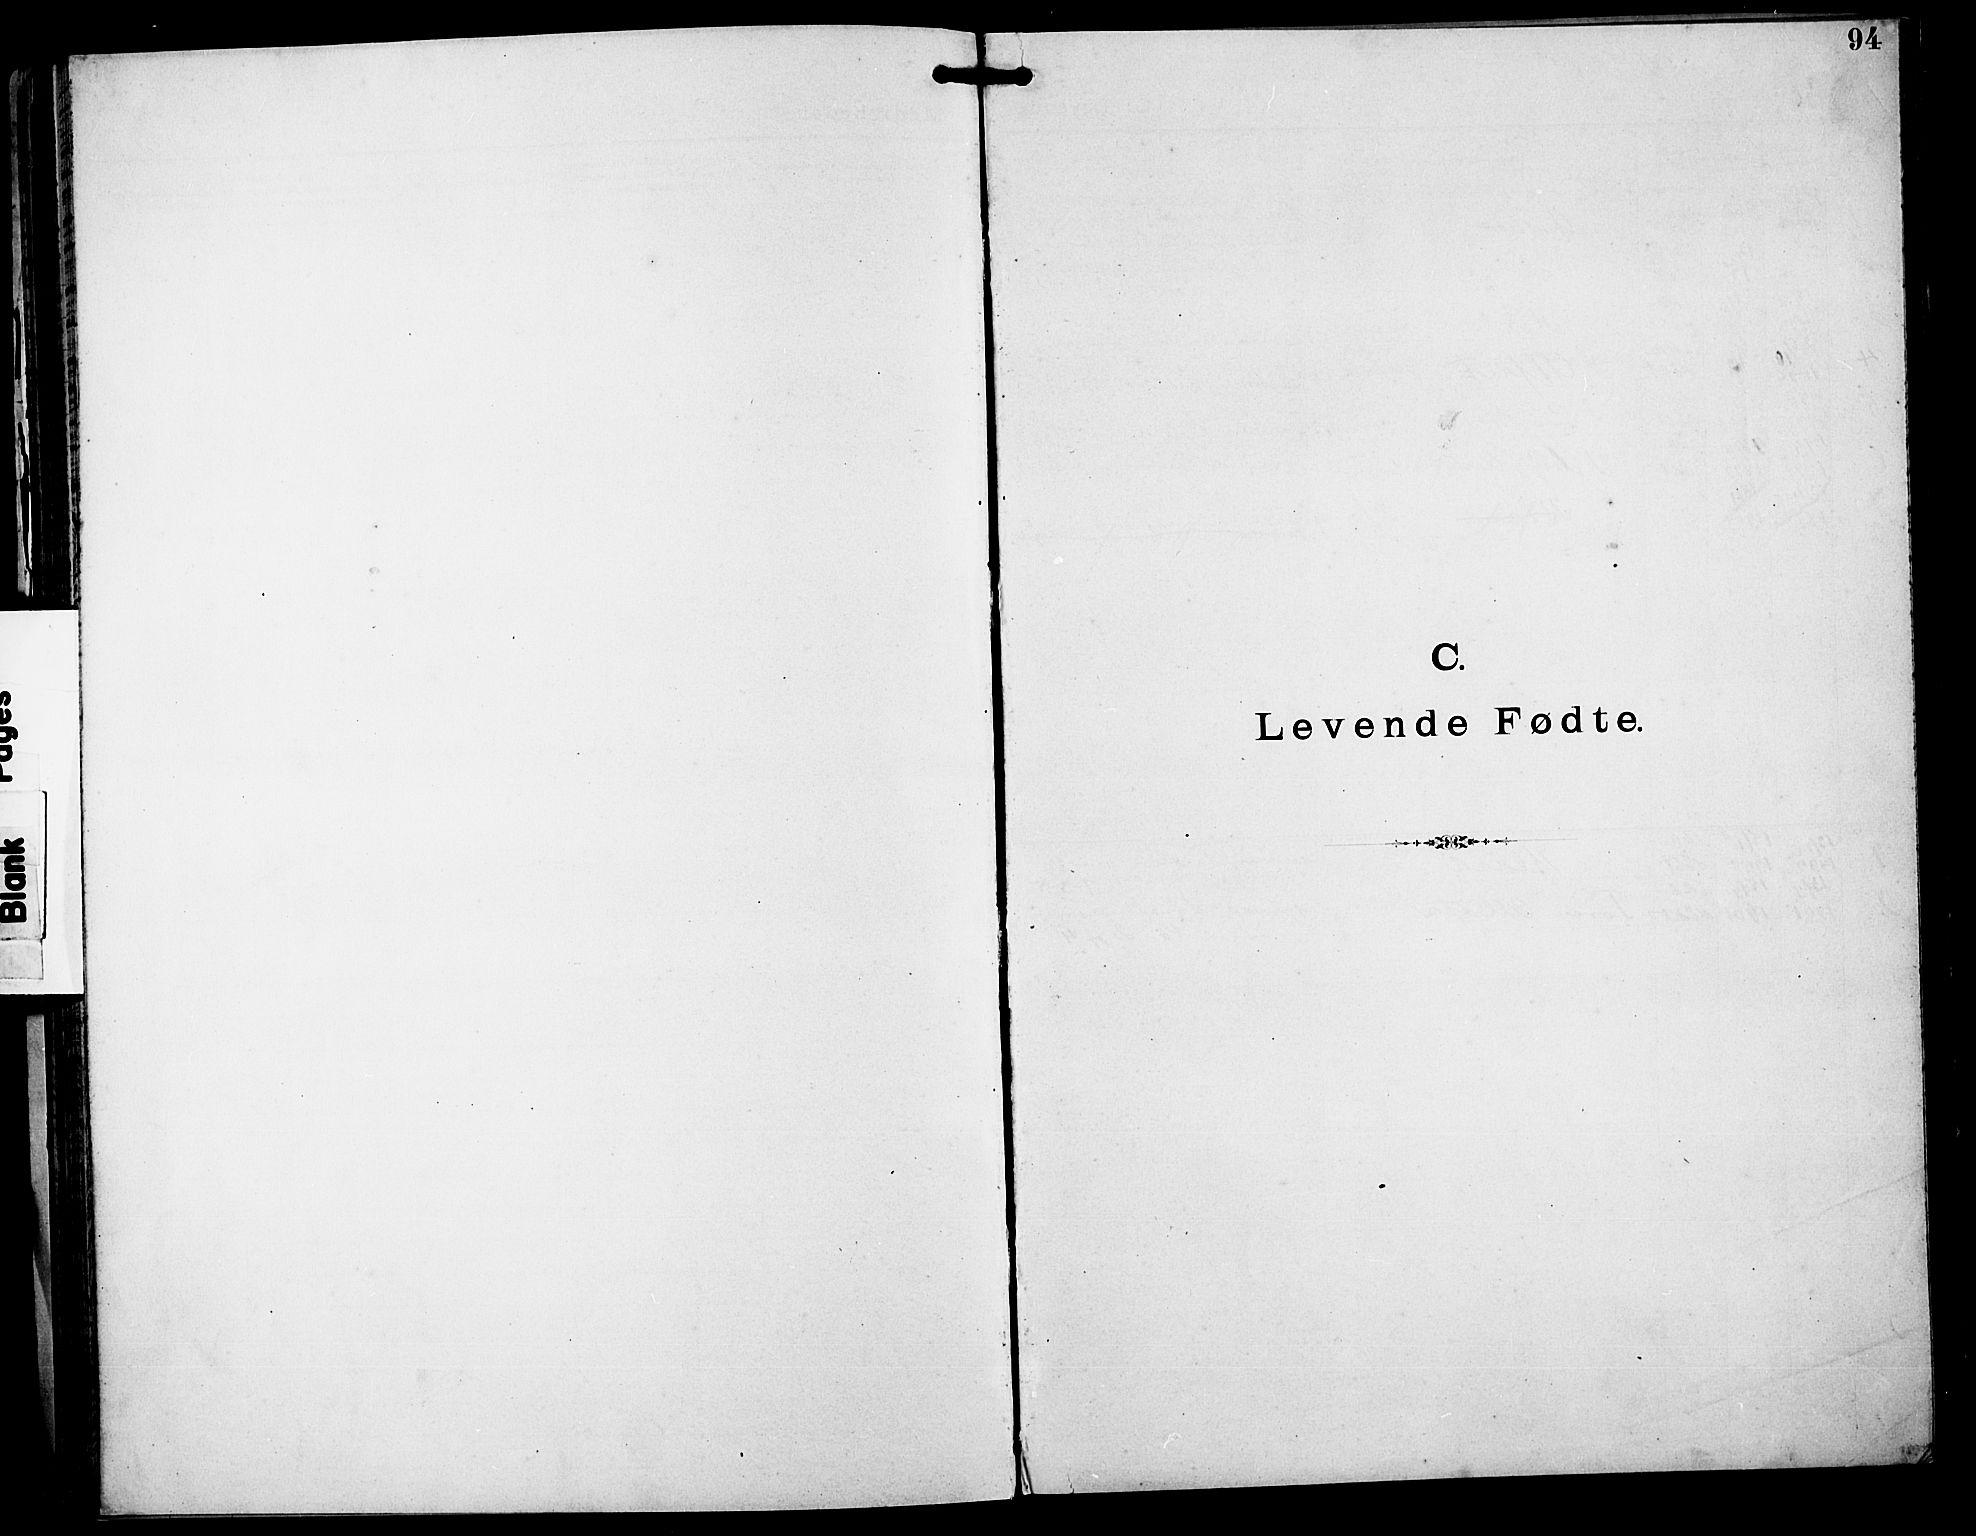 SAST, Stavanger amt*, Dissenterprotokoll nr. -, 1892-1902, s. 94